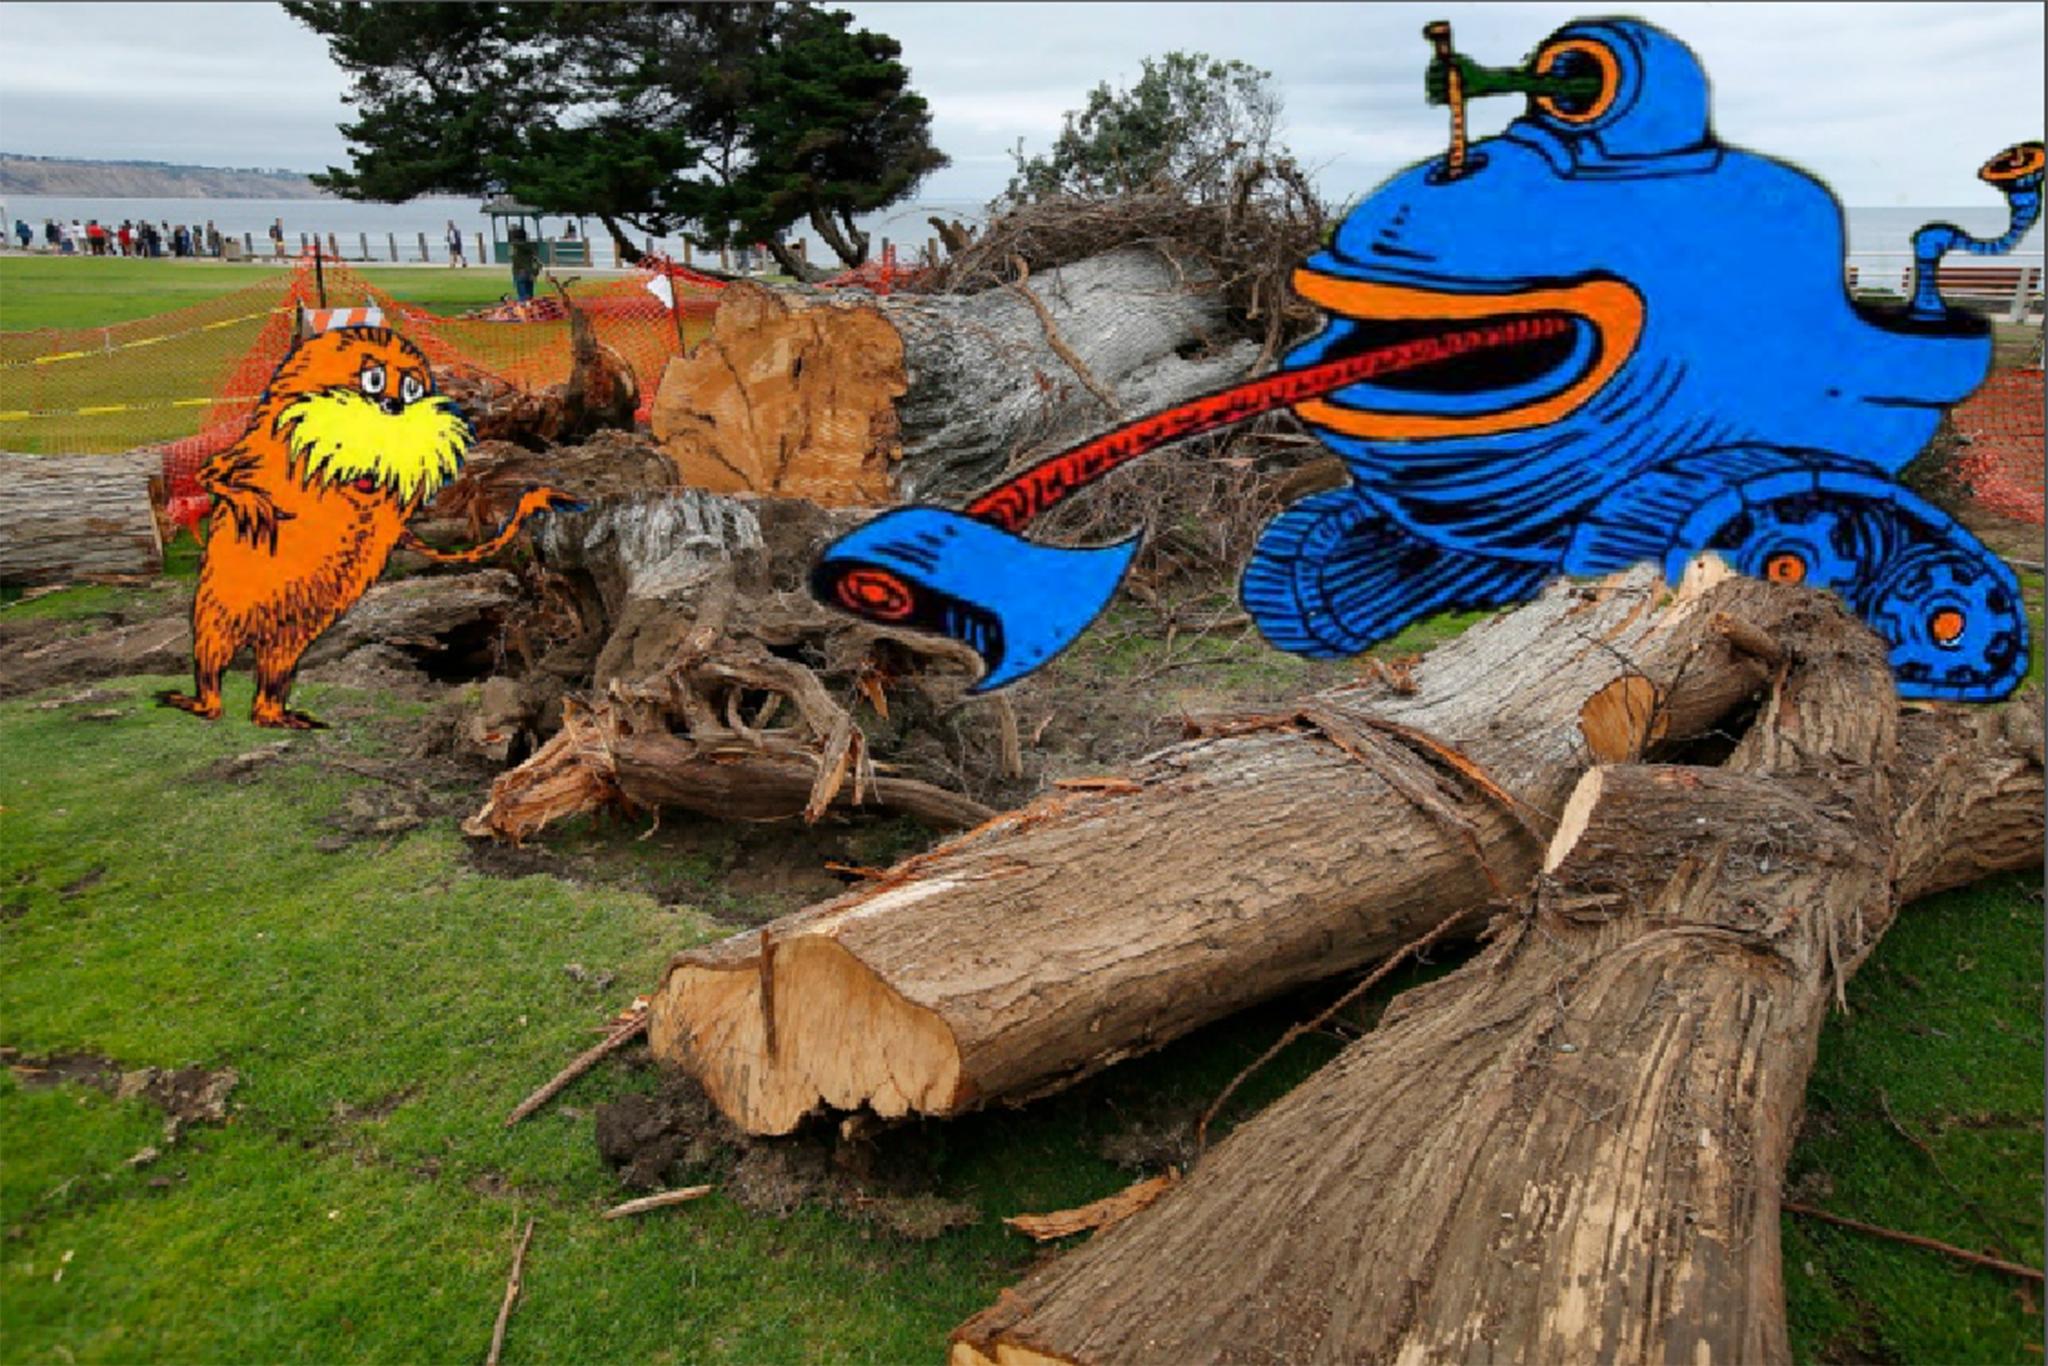 Captain of industry puts the axe to La Jolla's Lorax tree